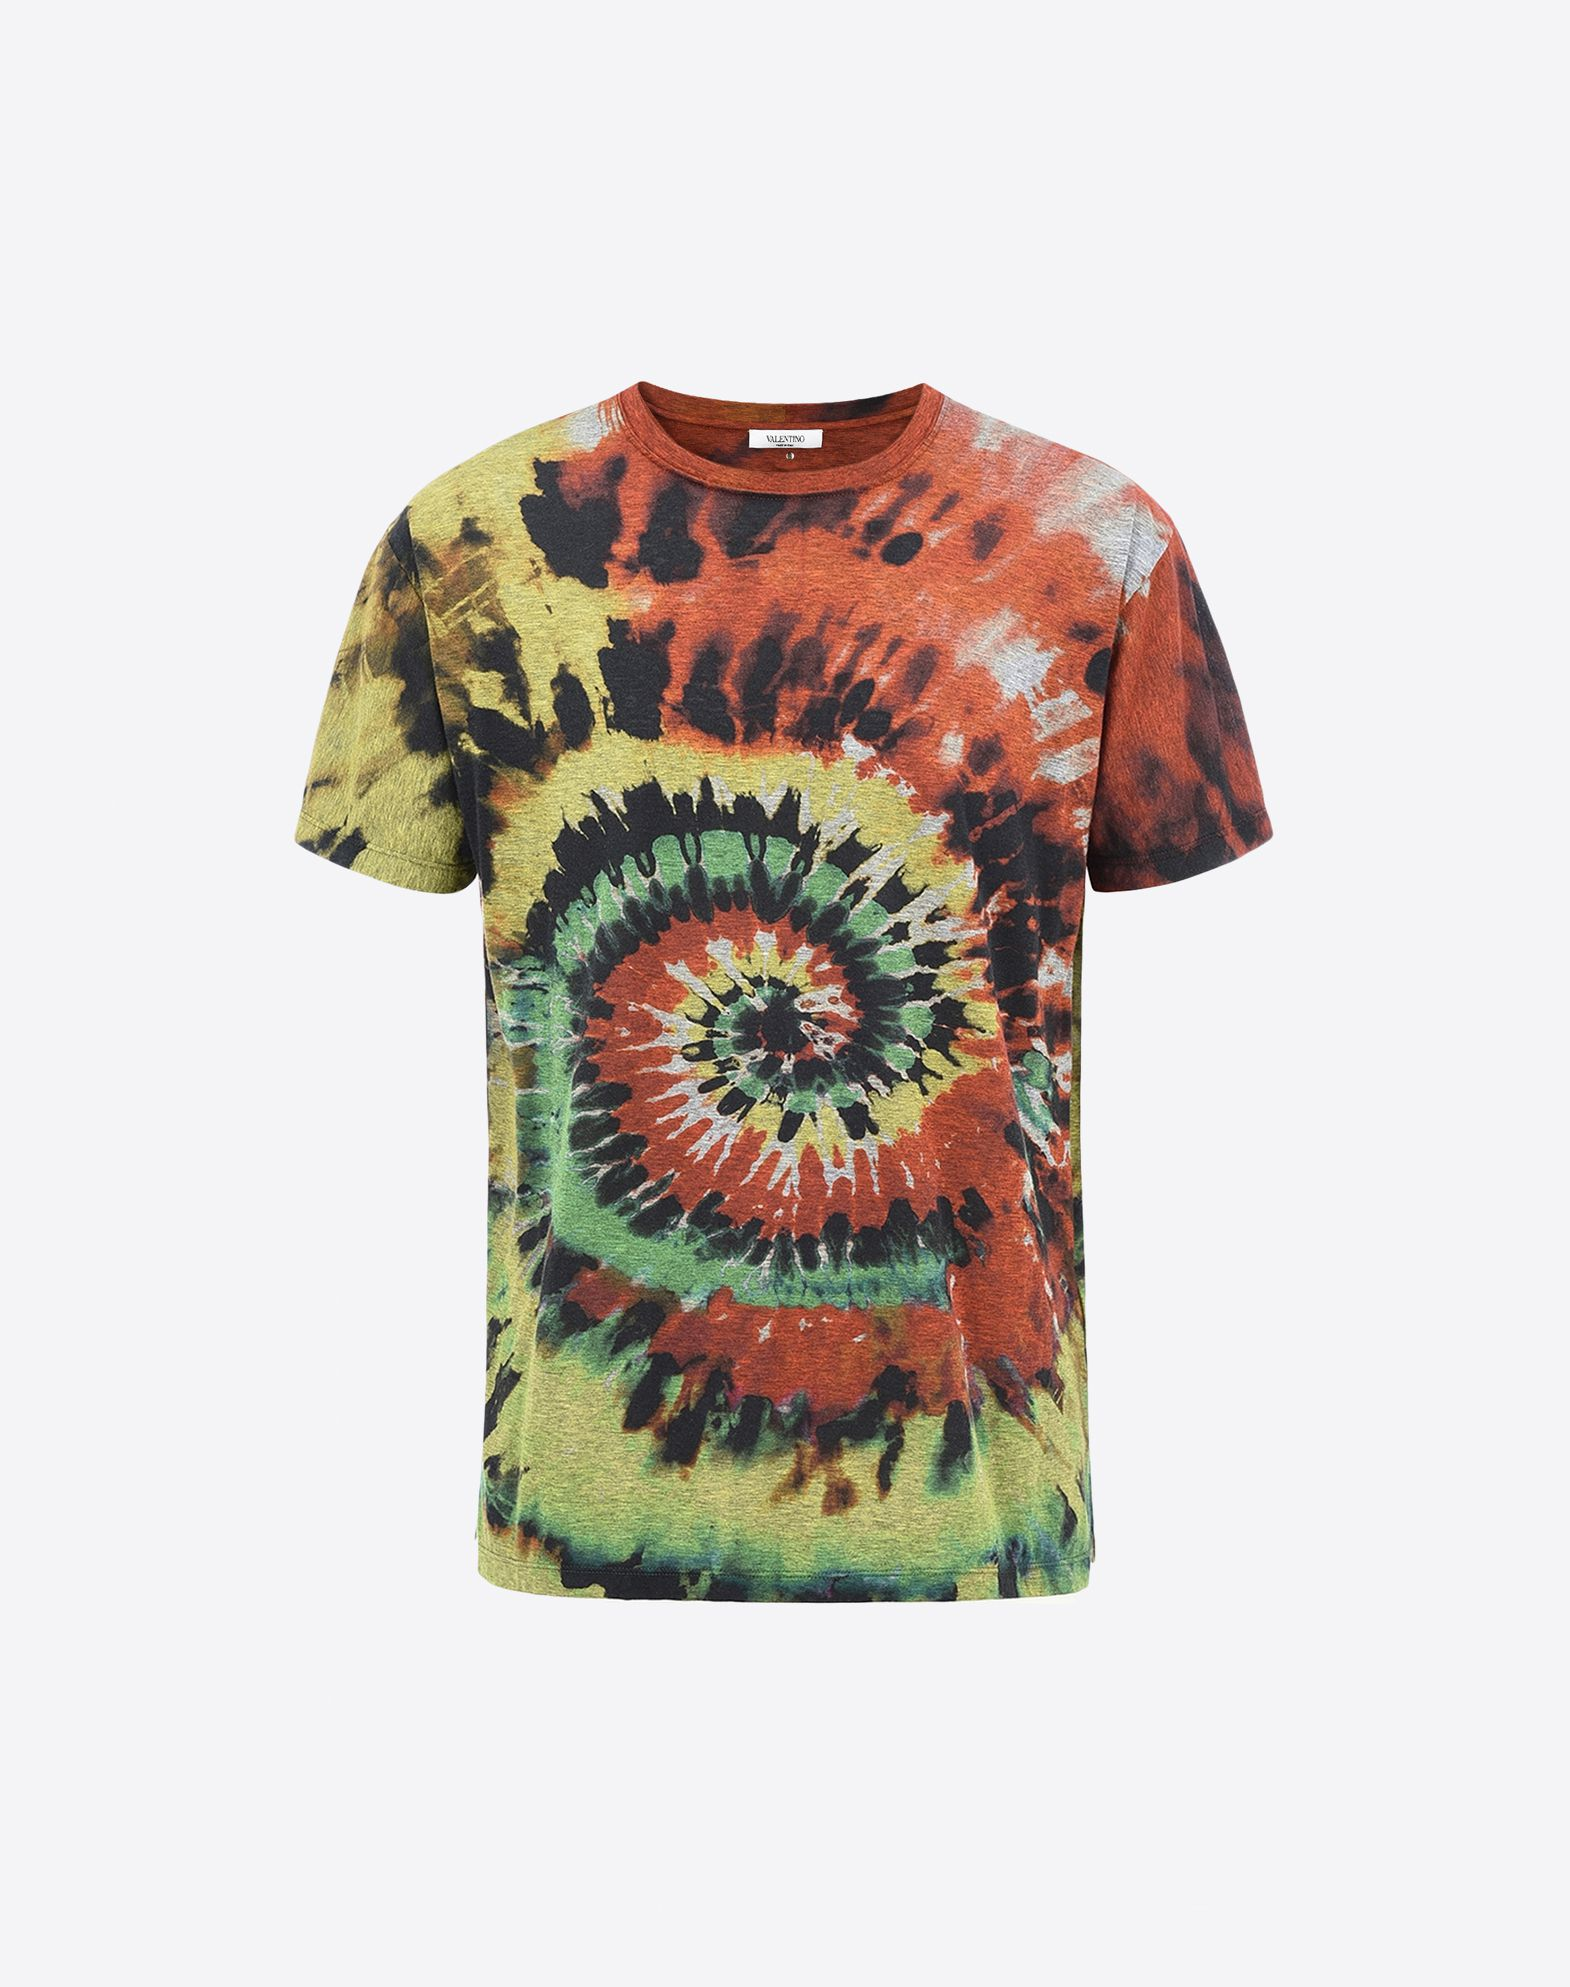 Valentino uomo tie dye print t shirt t shirts for men for Tie dye printed shirts